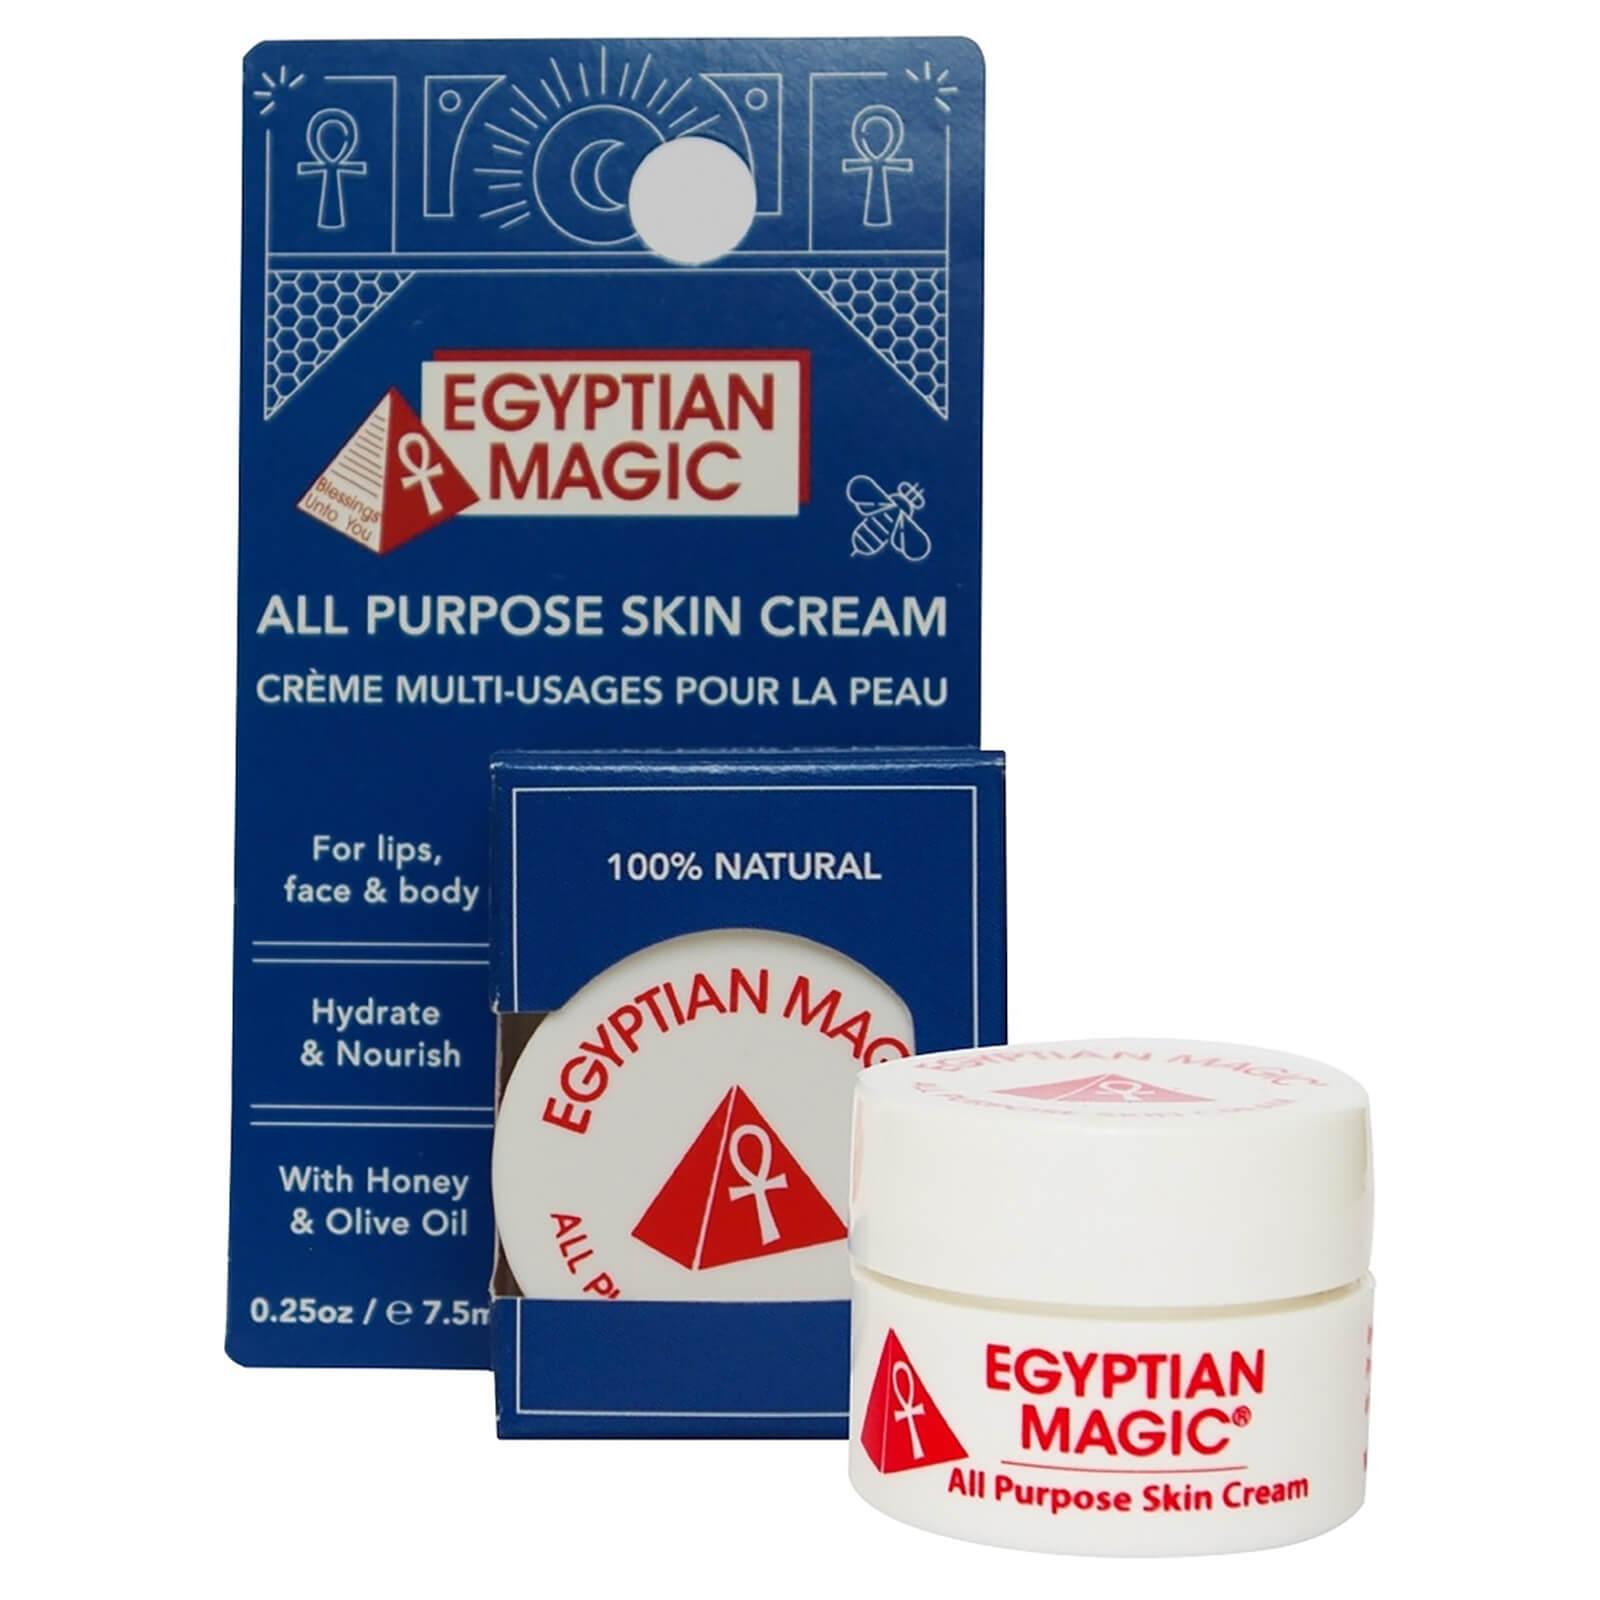 Egyptian Magic All Purpose Skin Cream 25oz